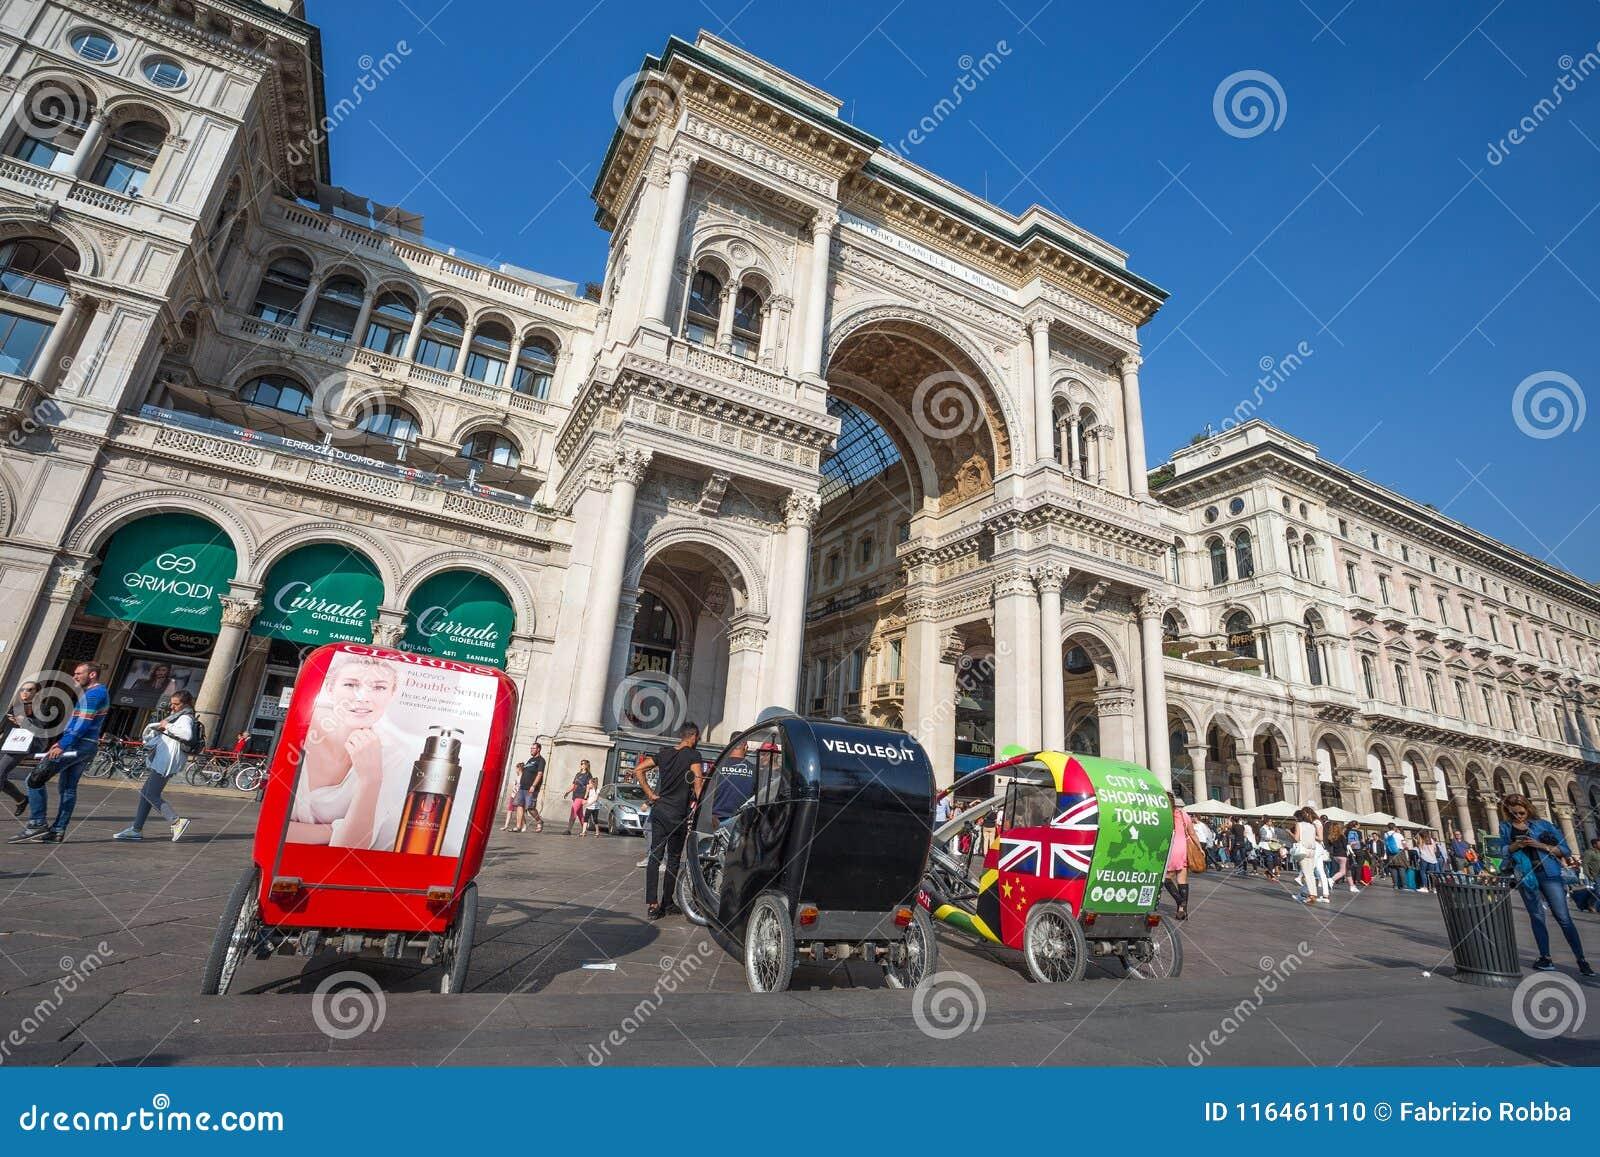 891b6f6fda4a Άποψη Vittorio Emanuele ΙΙ στοά σε Duomo Square Piazza Del Duomo ...